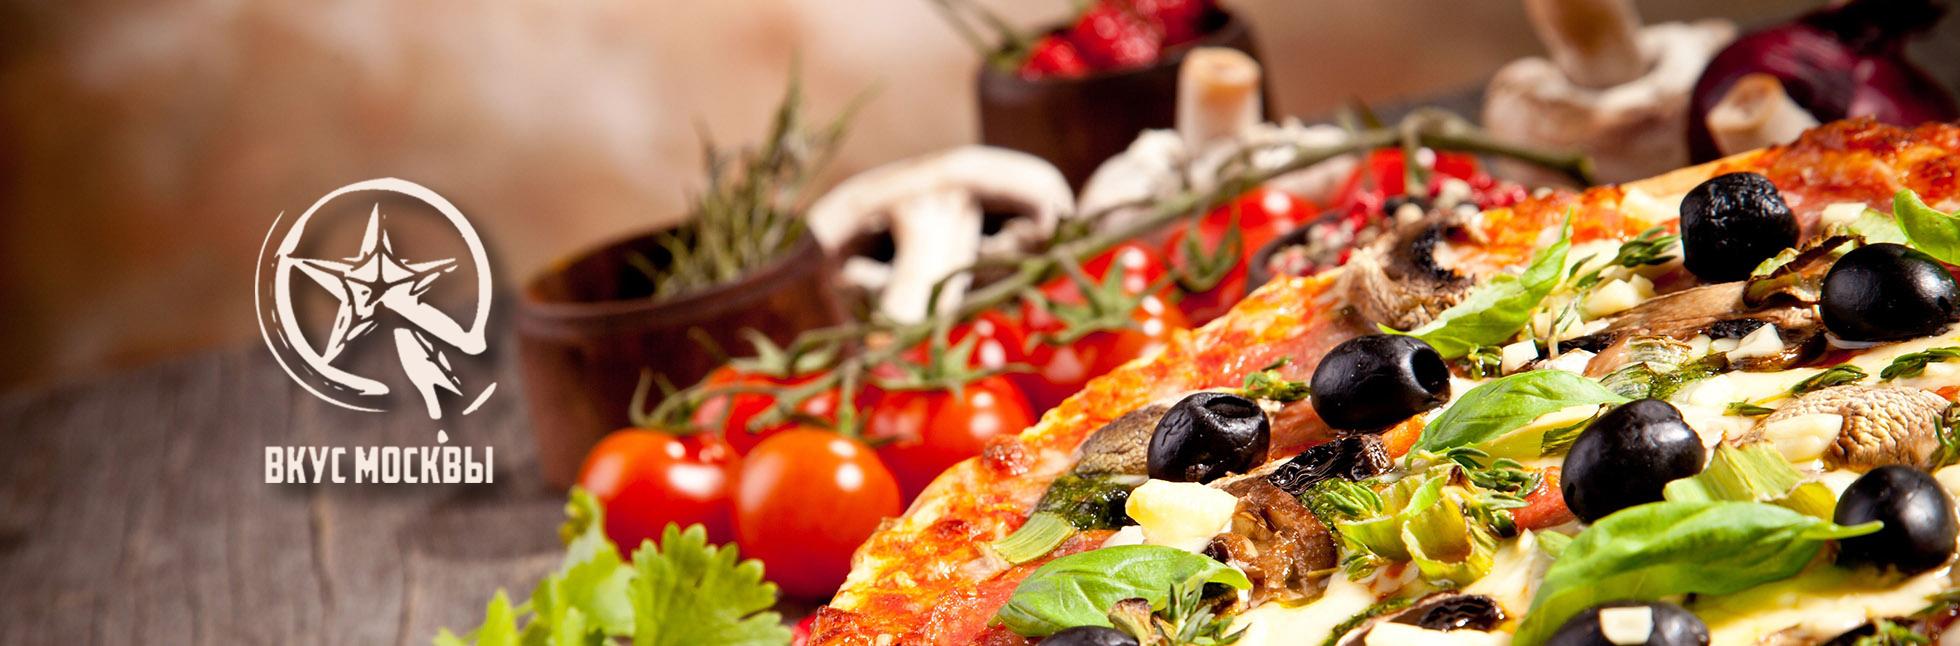 Доставка пиццы заказ москва